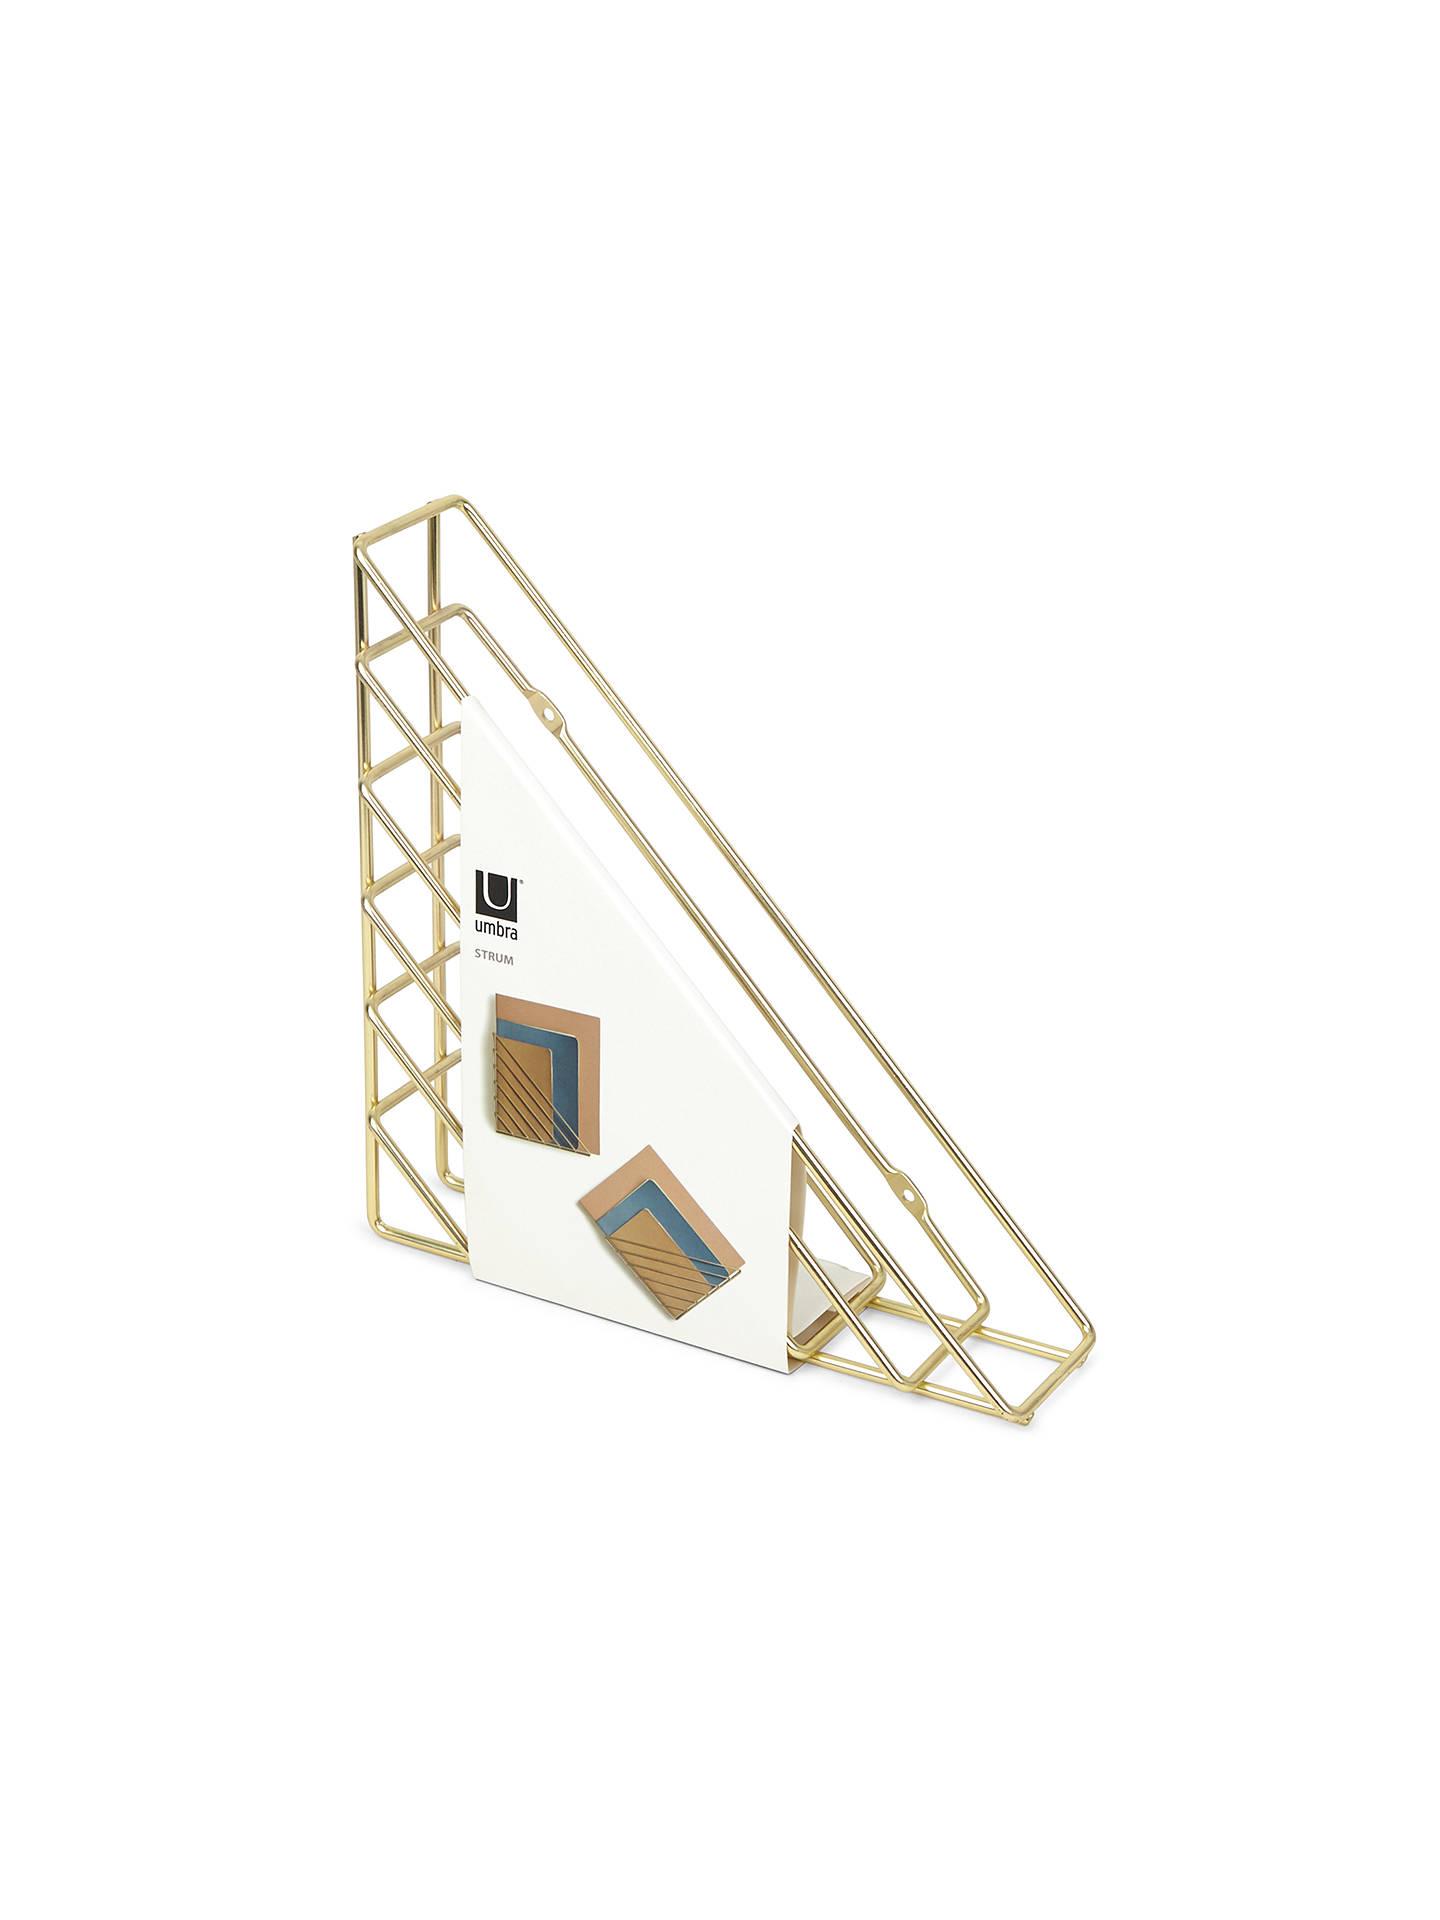 Strum Wall Organizer Brass Umbra 1004460-104